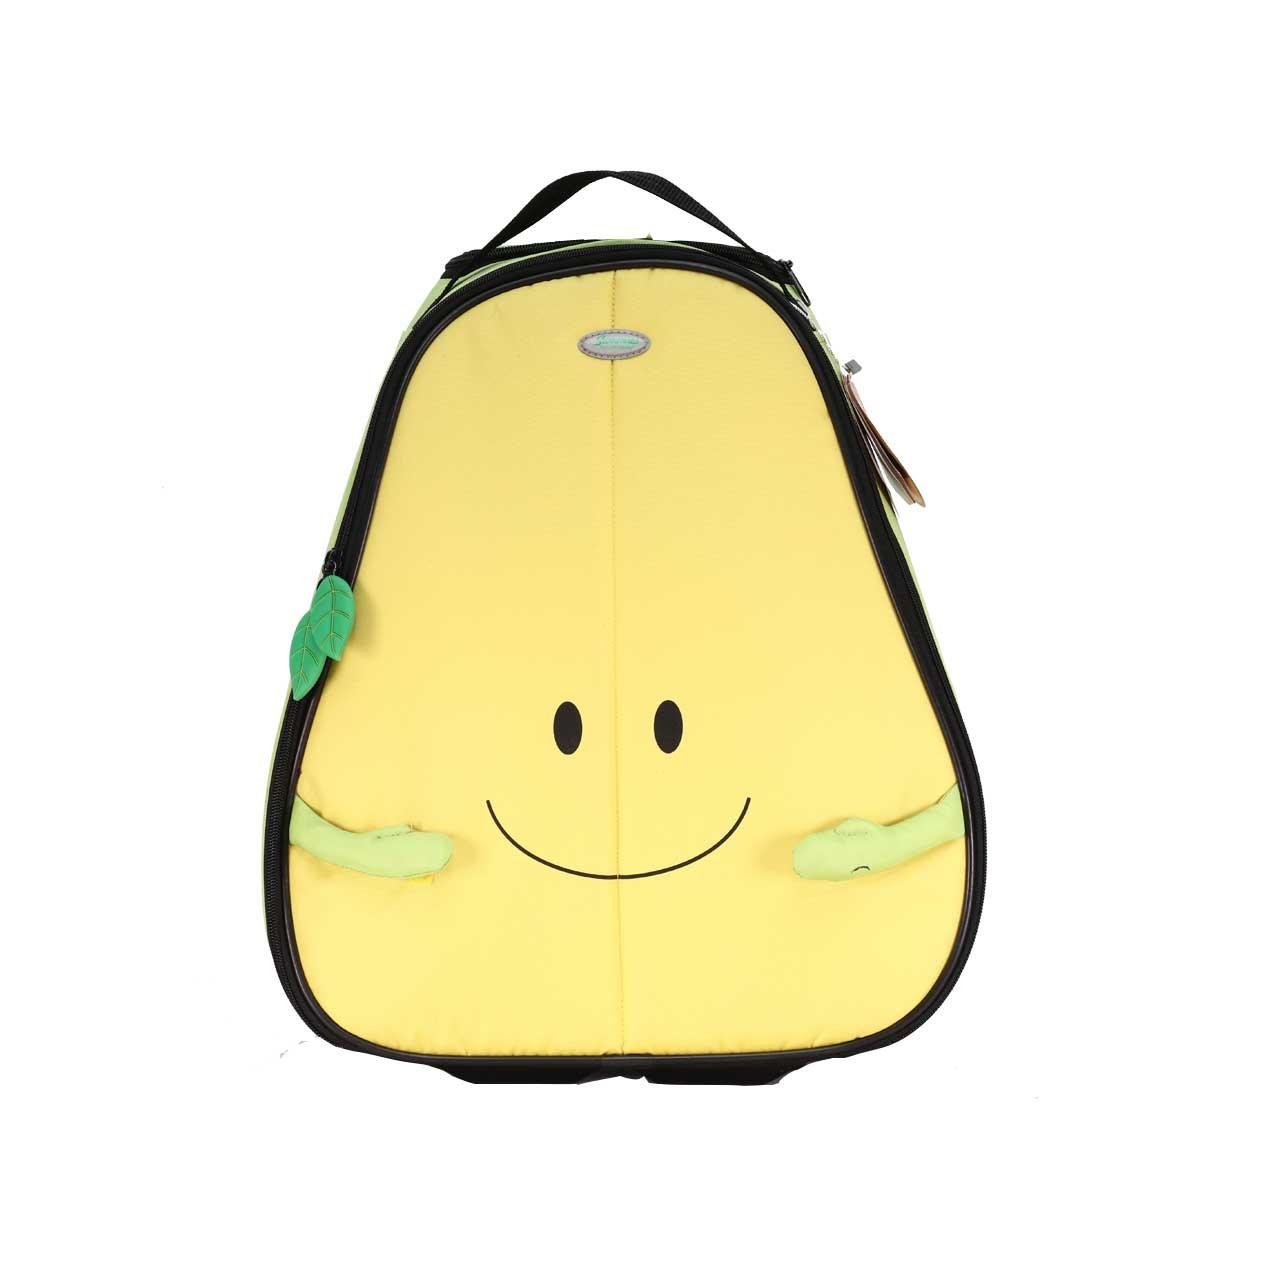 چمدان کودک سامسونایت طرح گلابی سبز کد 21U 00 007